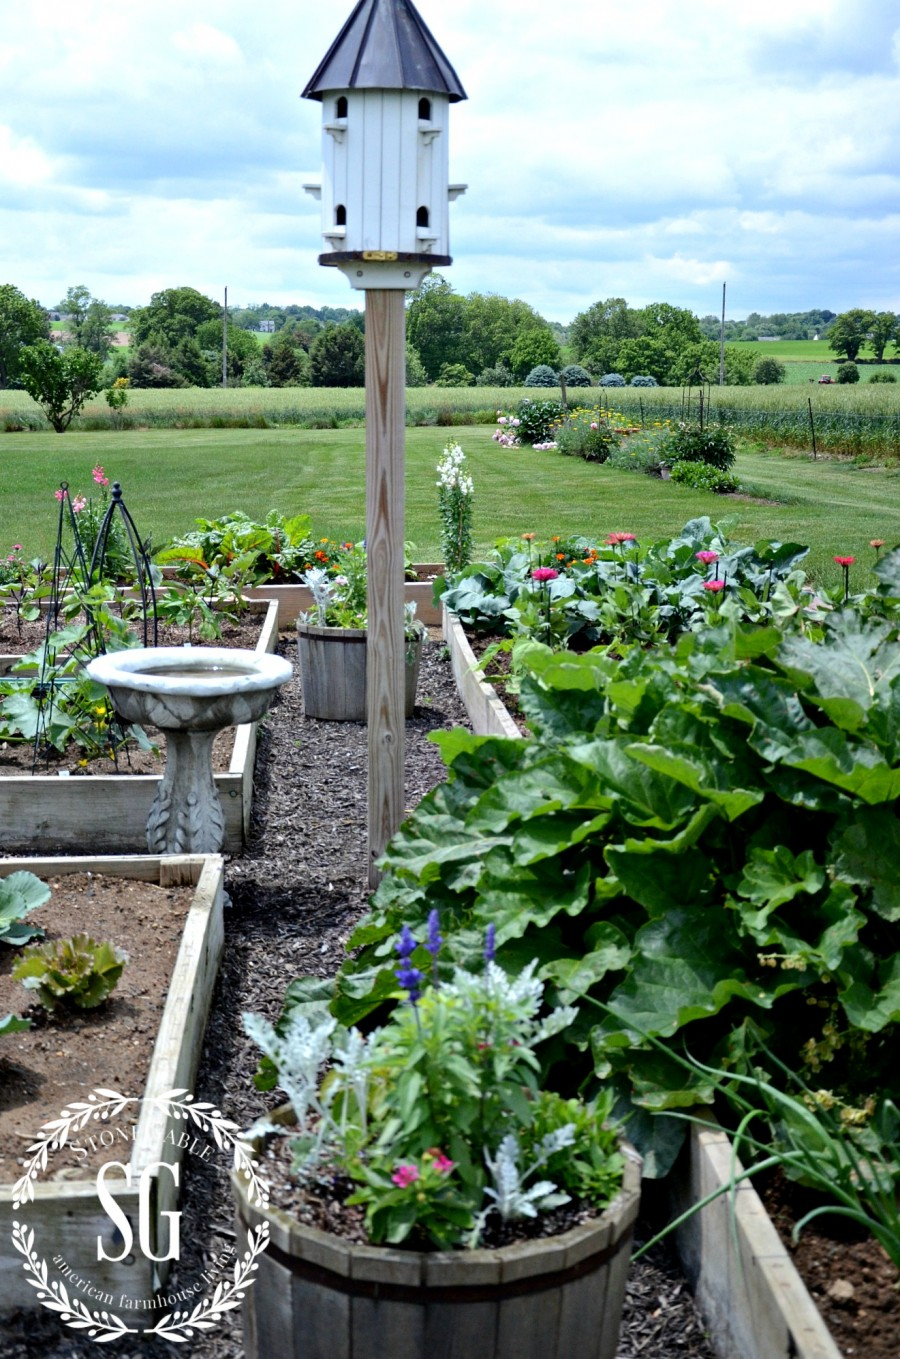 StoneGable garden-first planted-stonegableblog.com